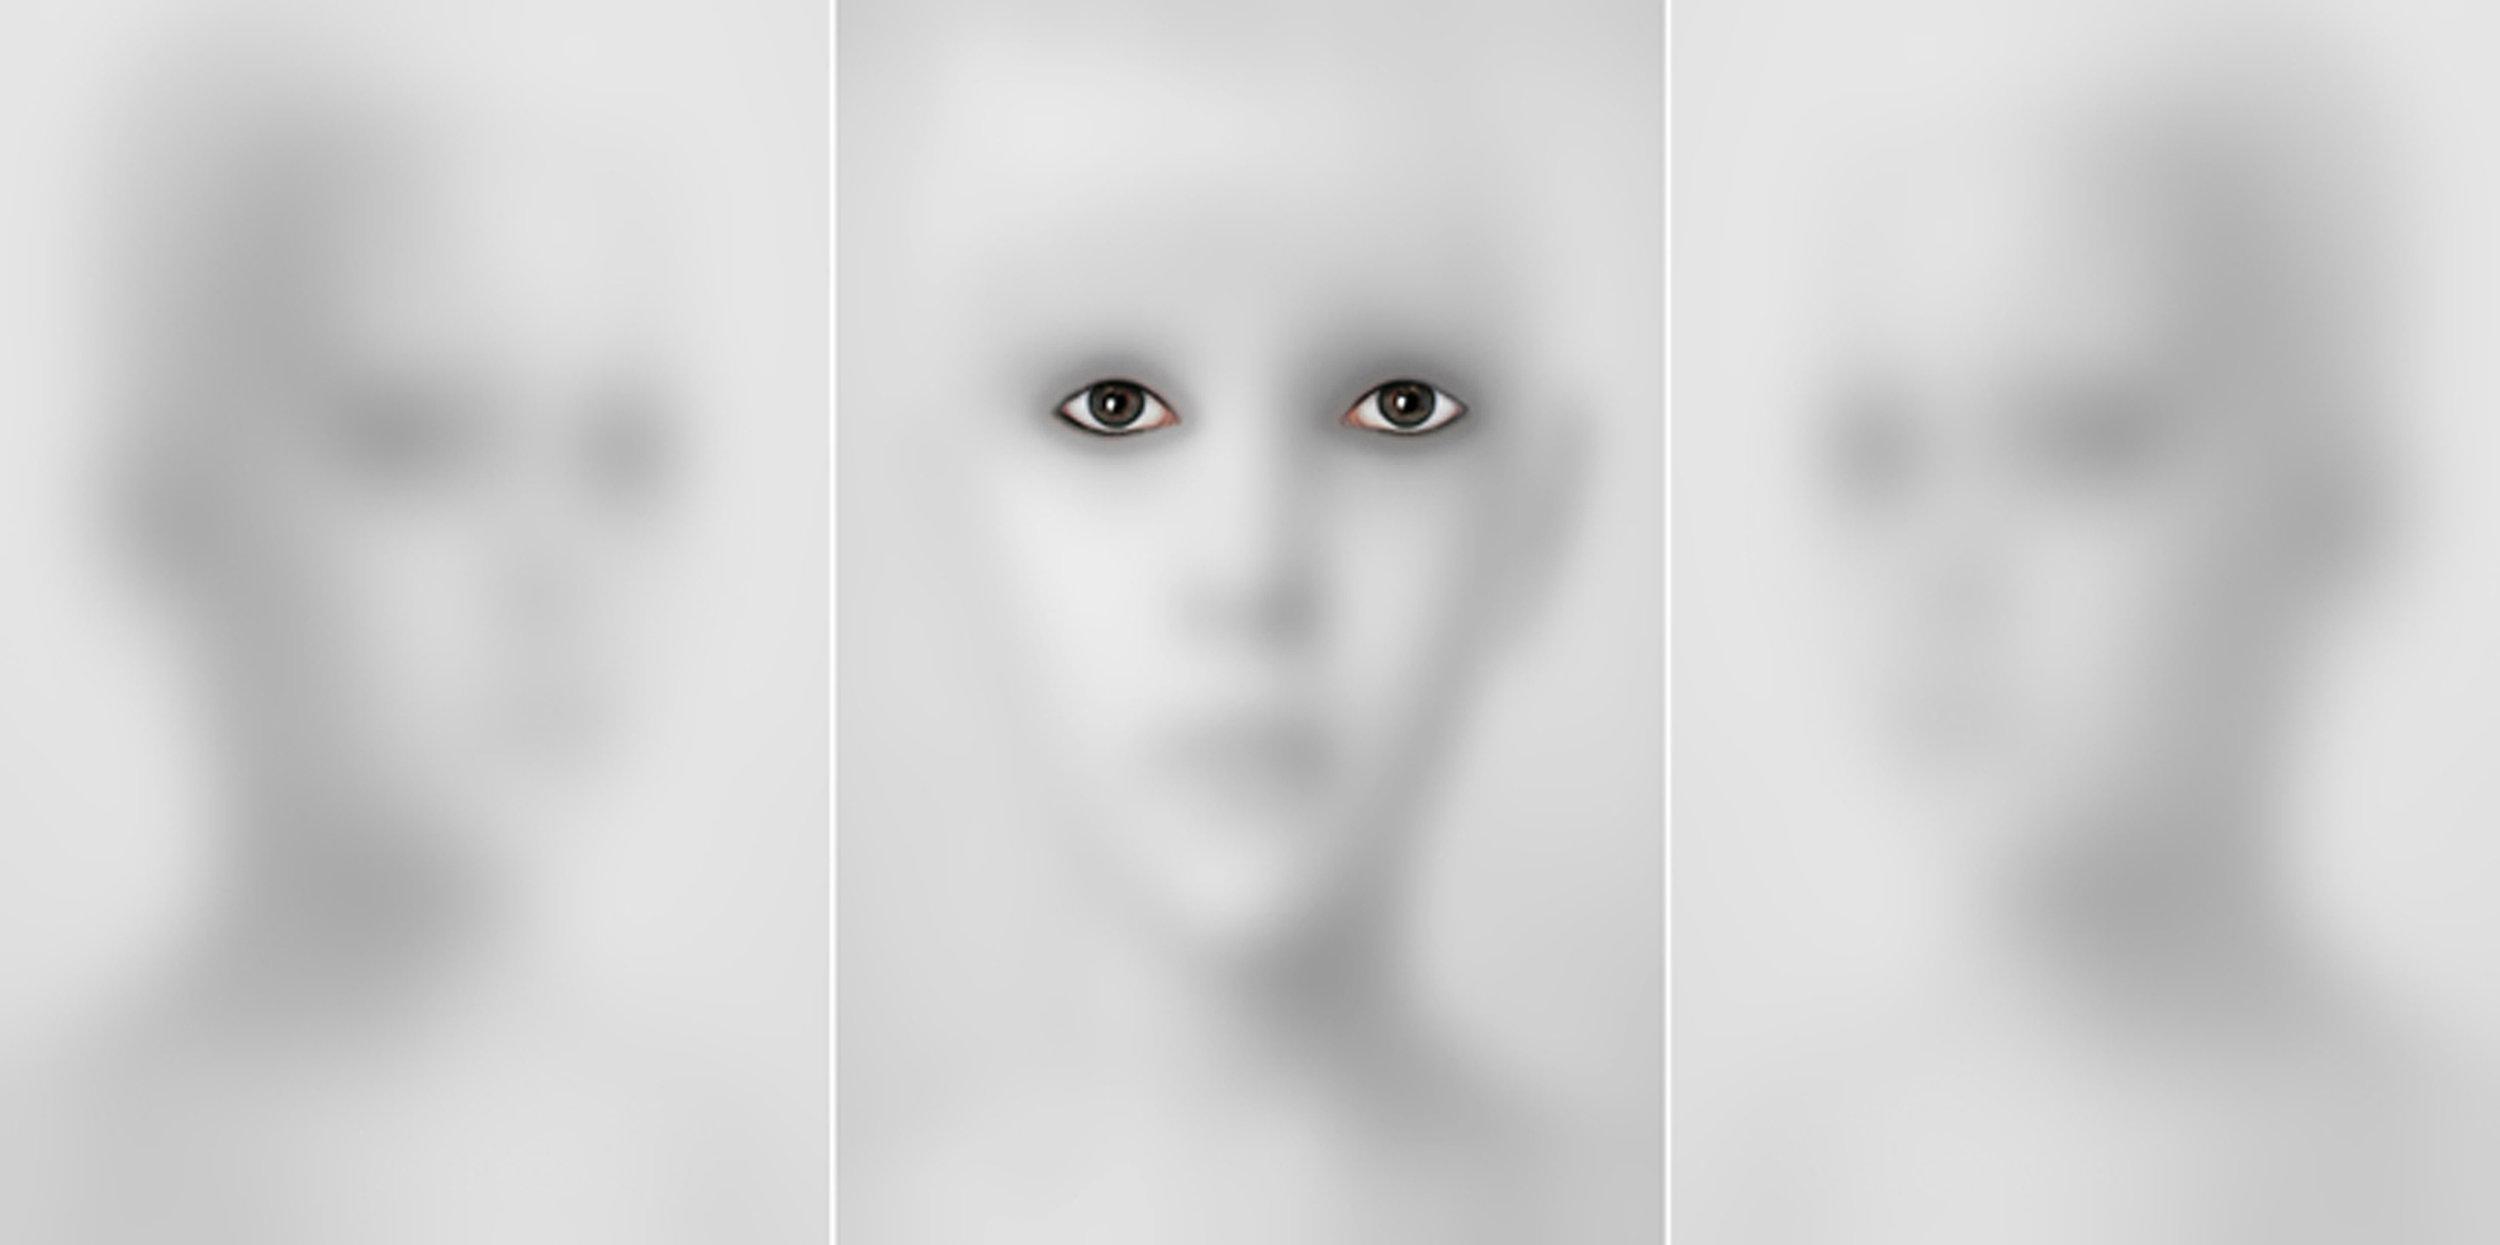 HALIM AL KARIM UNTITLED 1. from WITNESS PORTRAIT series. h 190 x w 390 cm ( tribtych), Photograph Lambda Print 2004, Edition 1 of 3 +2 AP.jpg